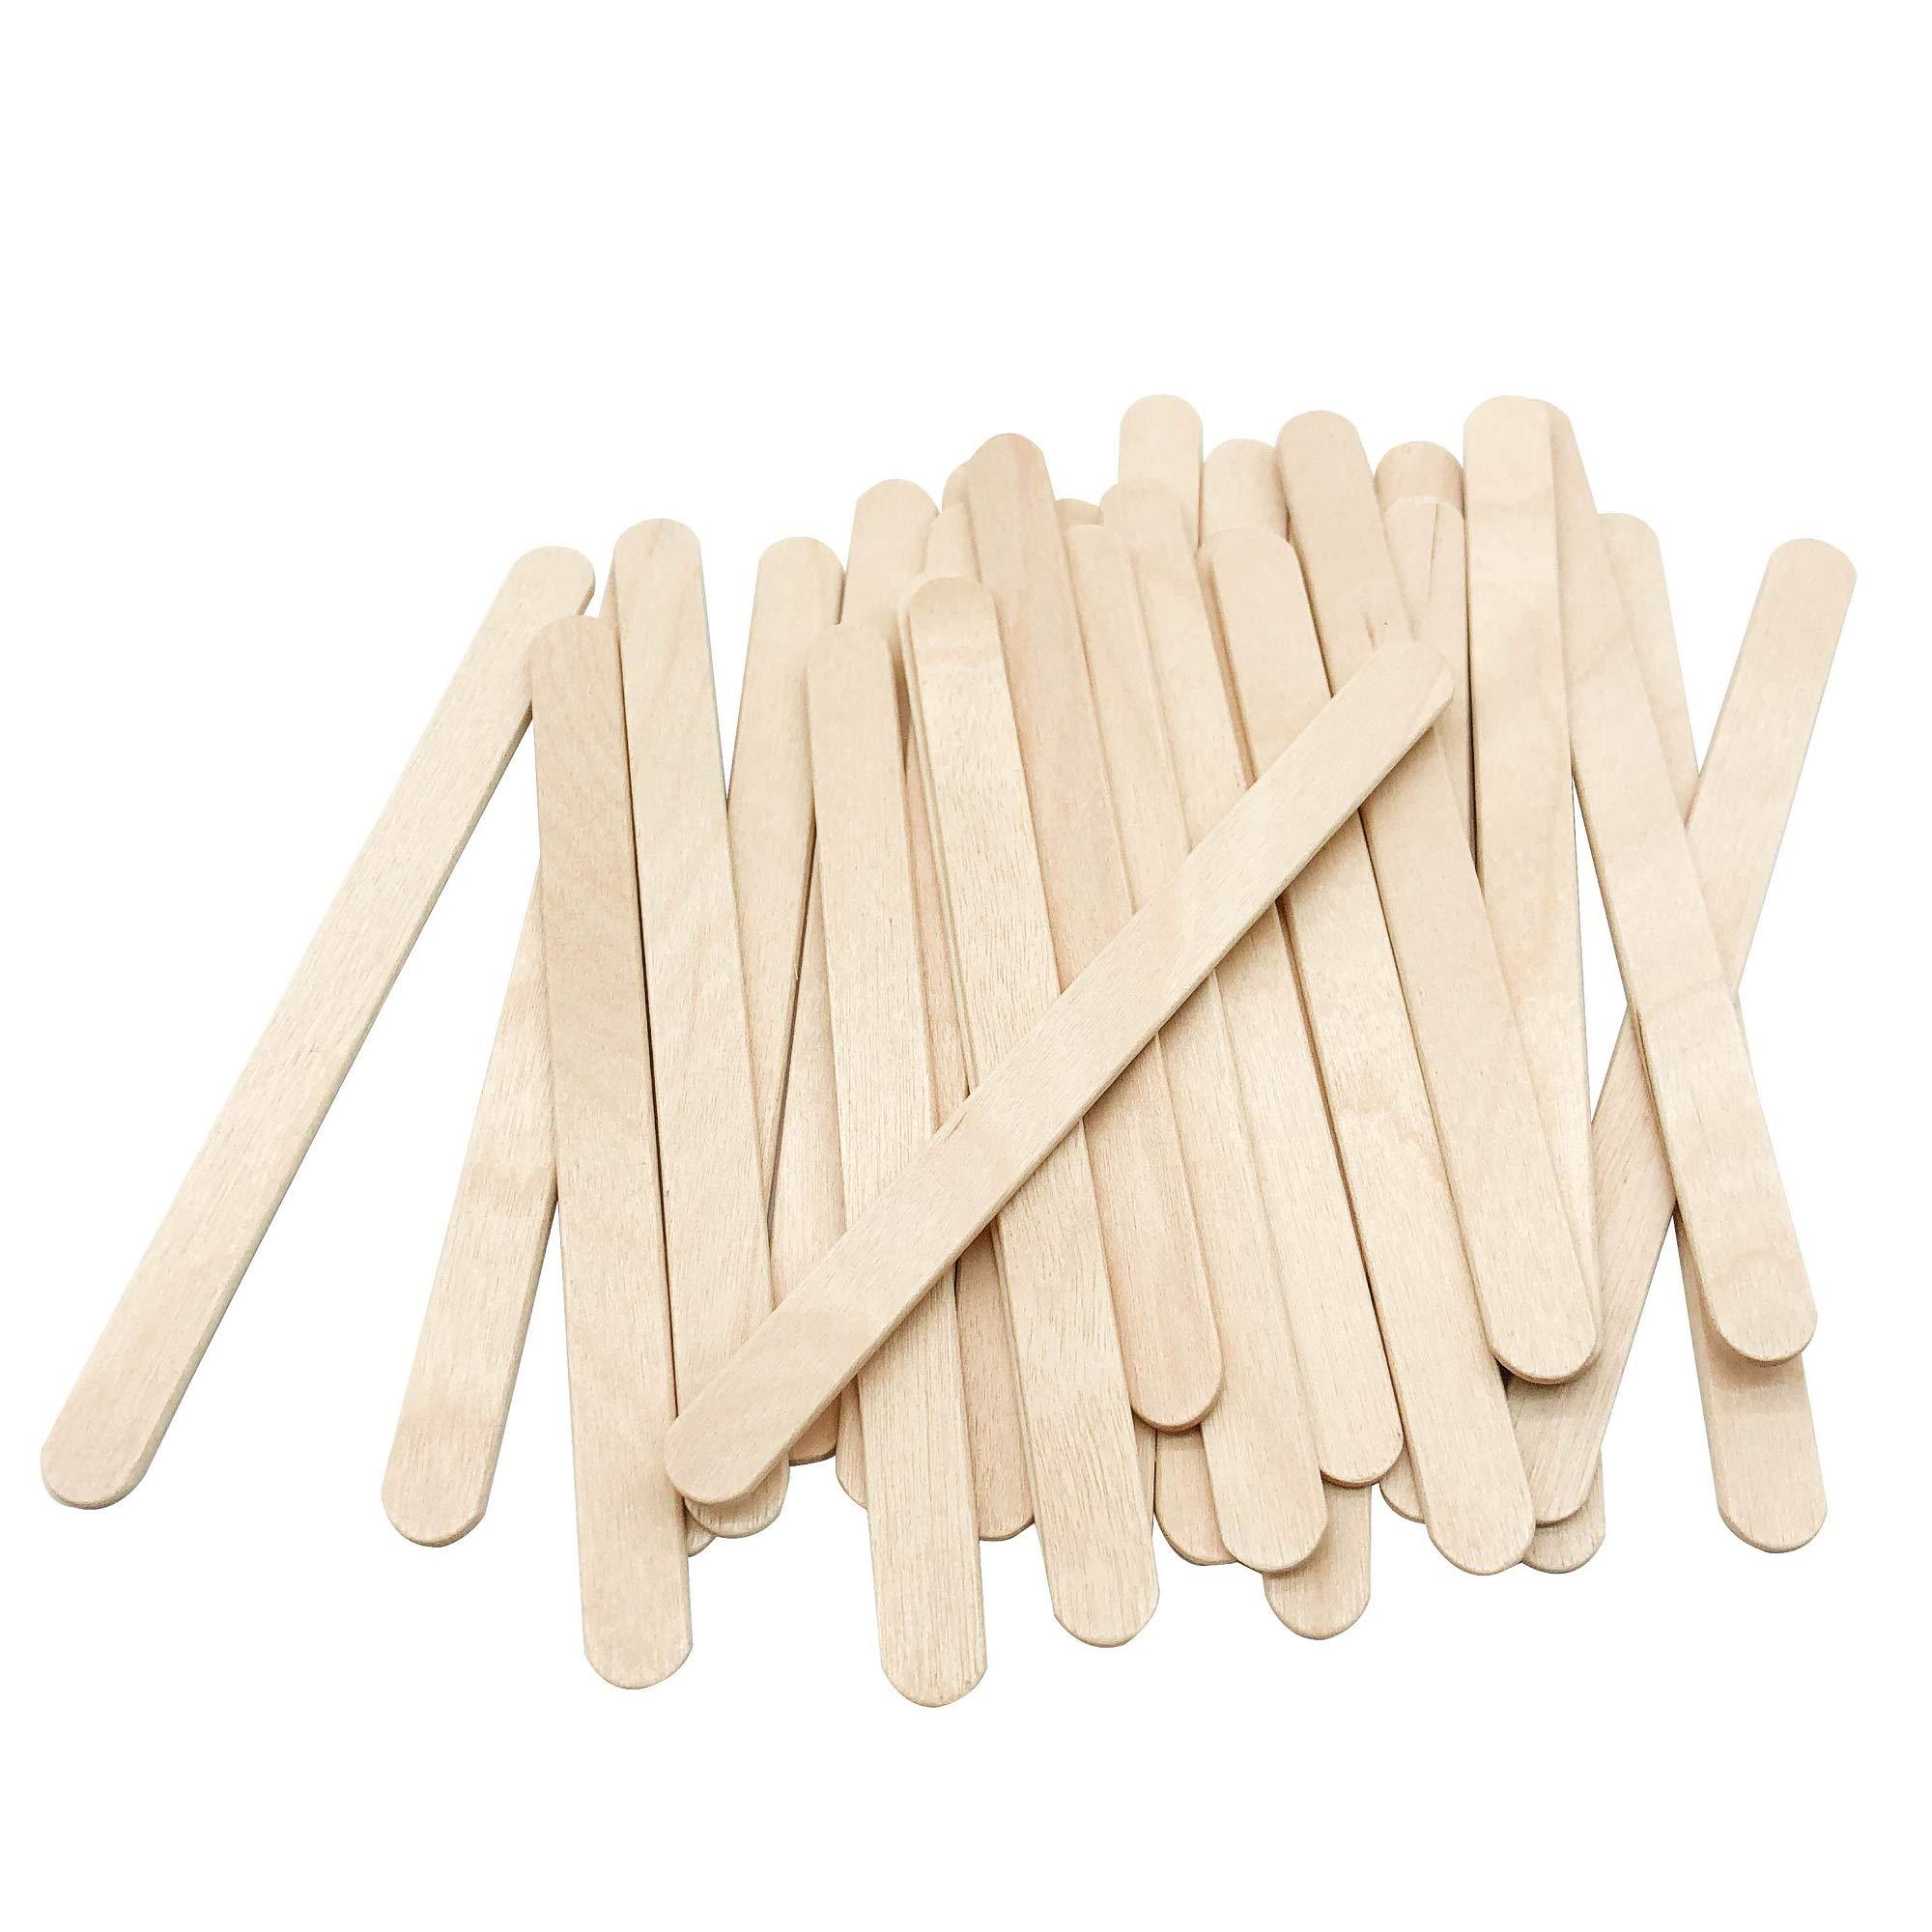 amazon com karlash jumbo craft sticks 6 length pack of 100 beauty